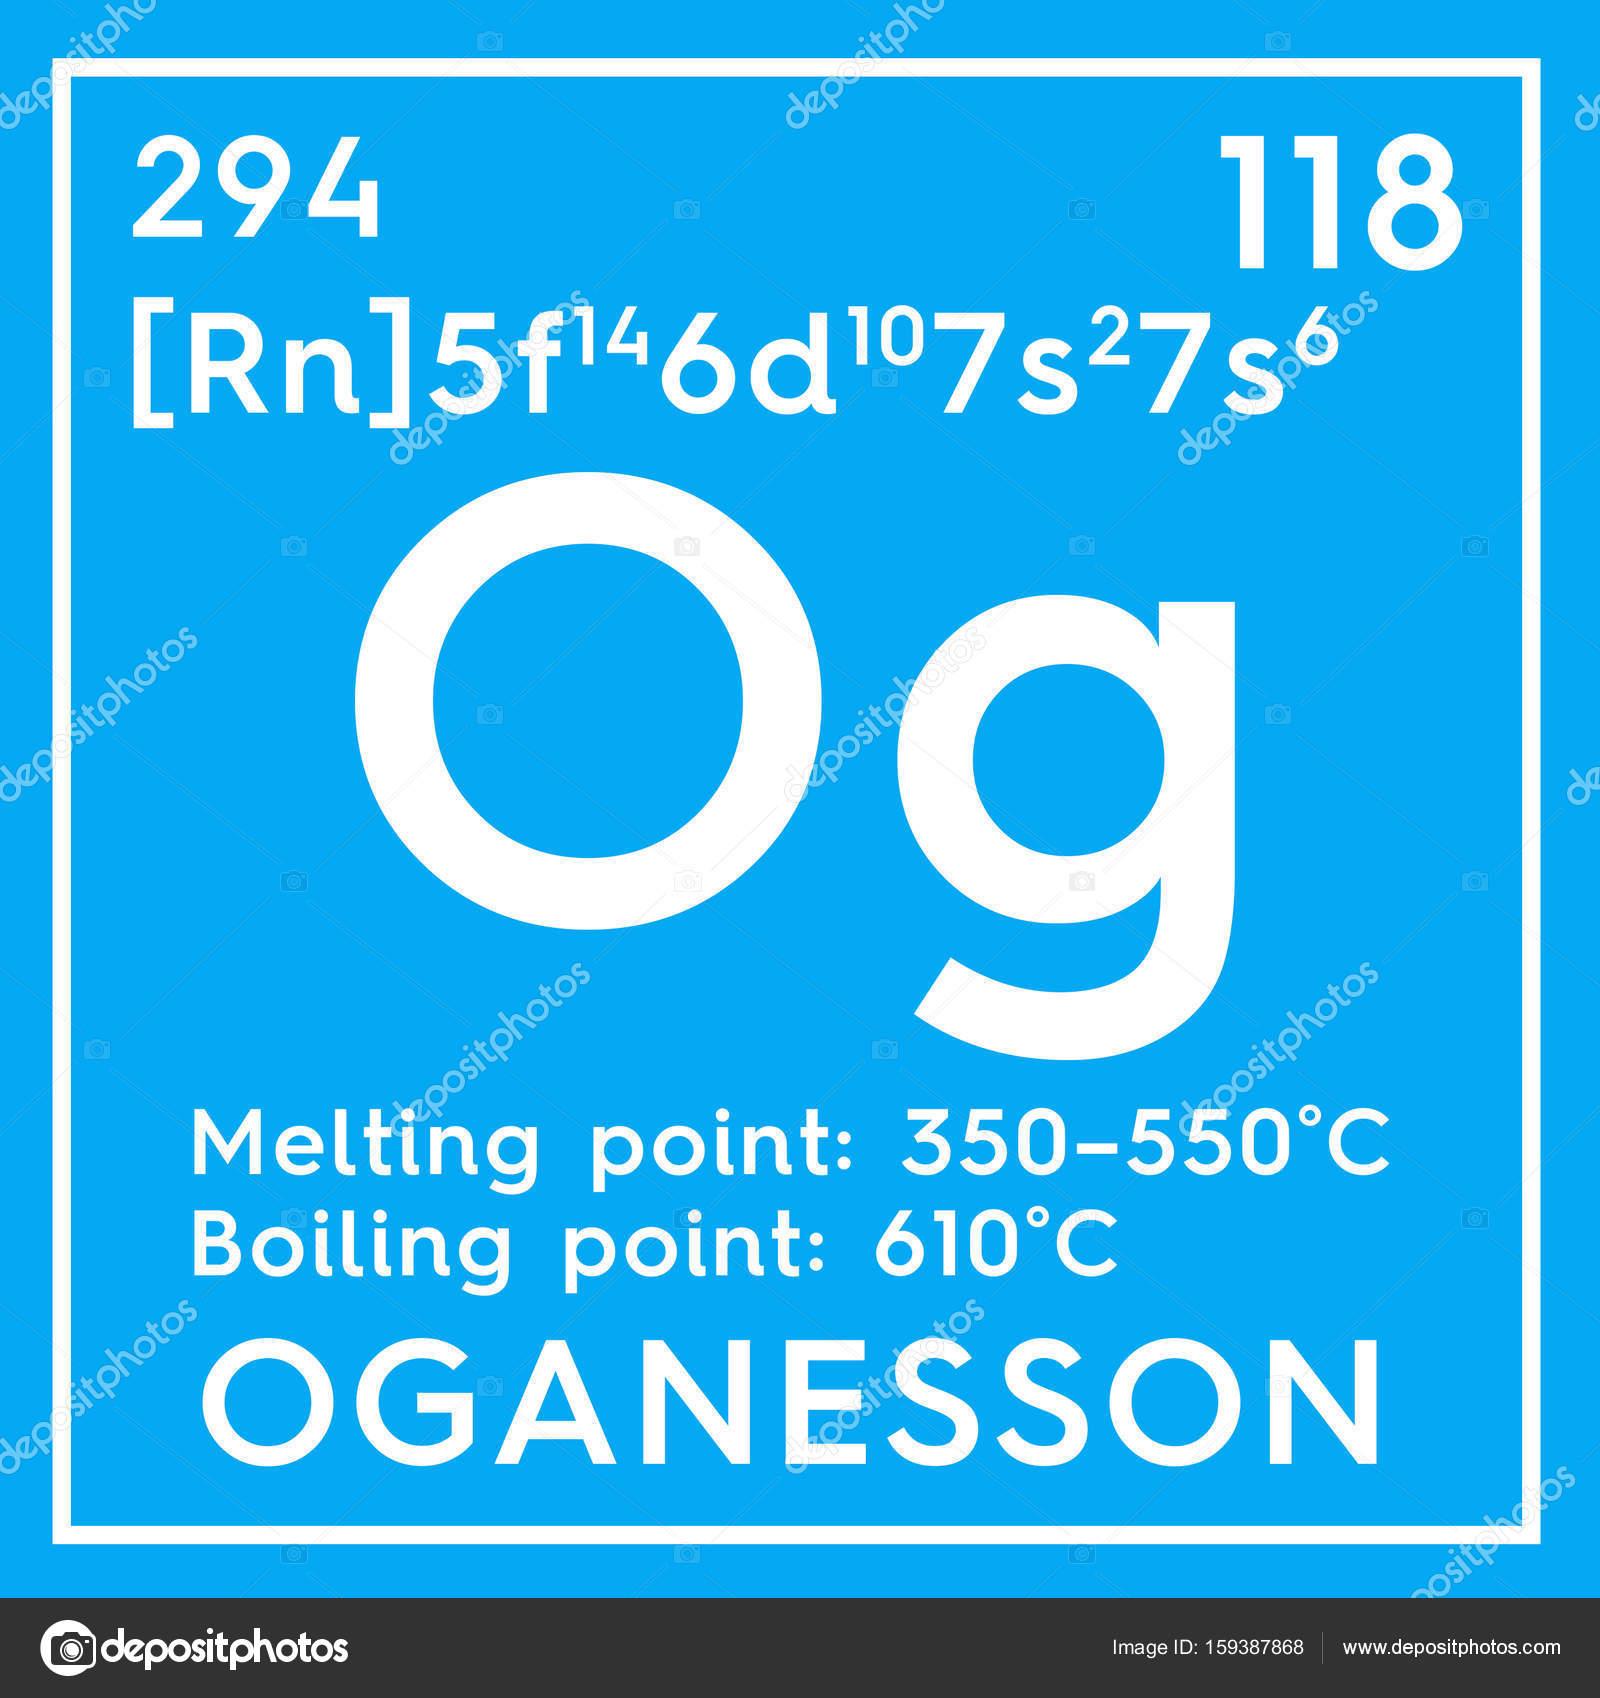 Oganesson gases nobles elemento qumico de la tabla de periodica gases nobles elemento qumico de la tabla de periodica de mendeleiev foto urtaz Choice Image